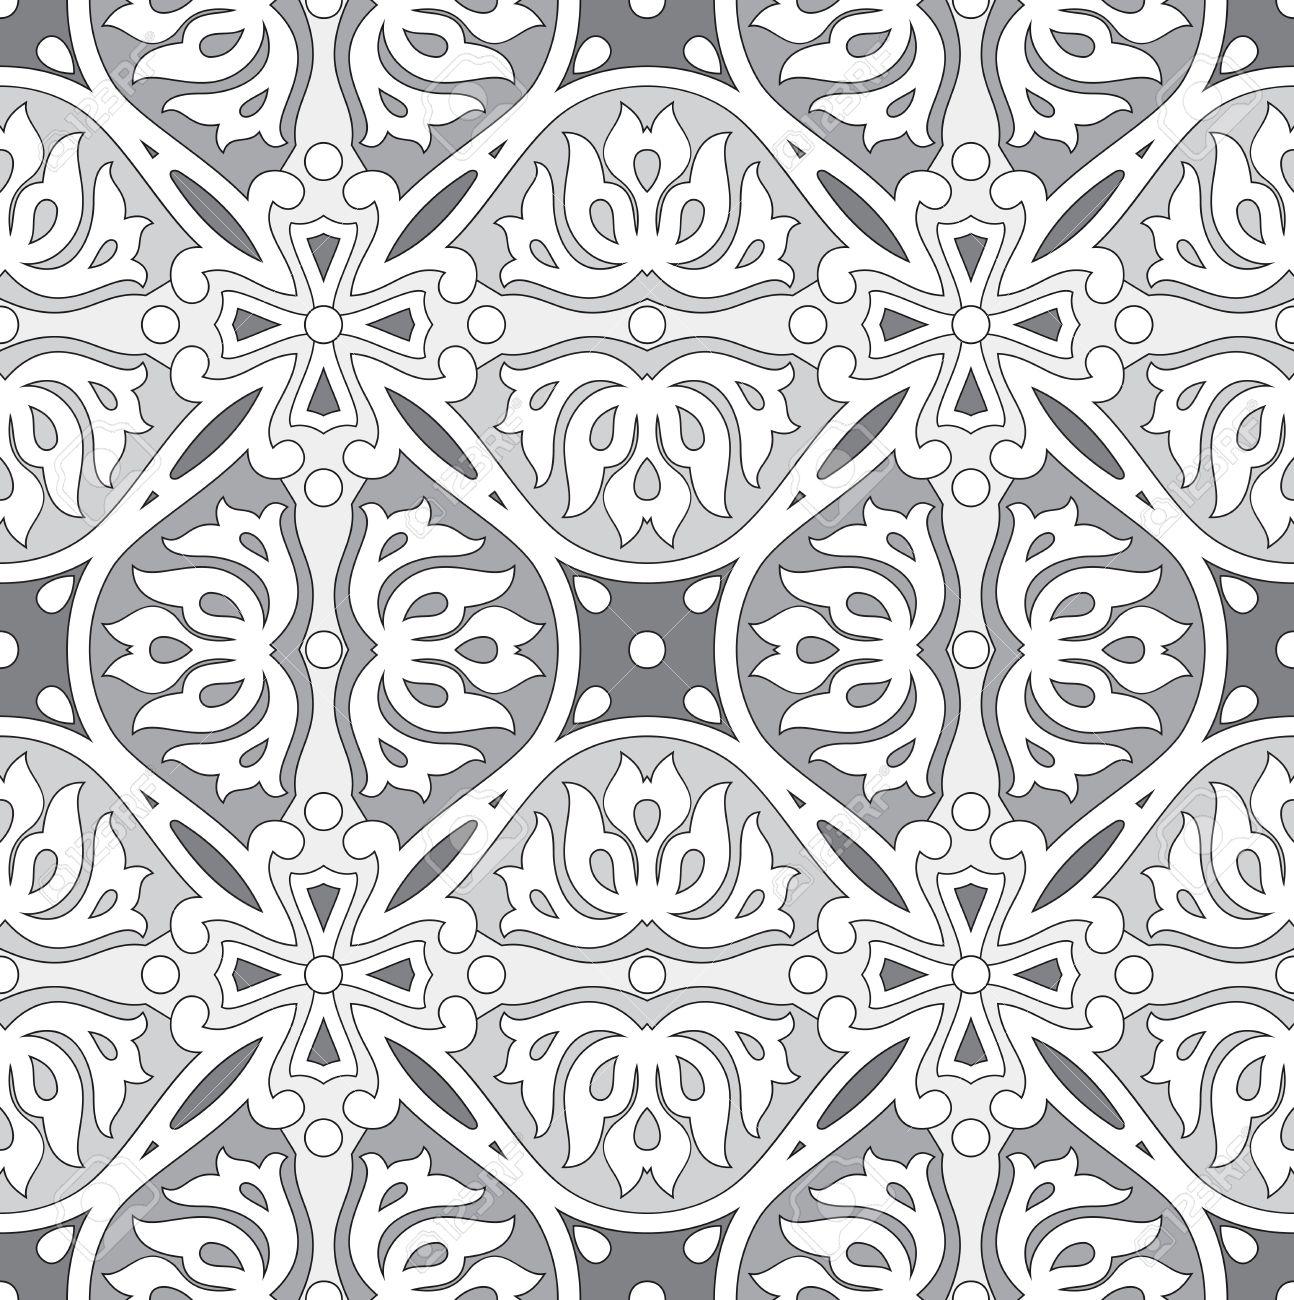 Seamless Silver Damask Wallpaper Royalty Free Cliparts Vectors